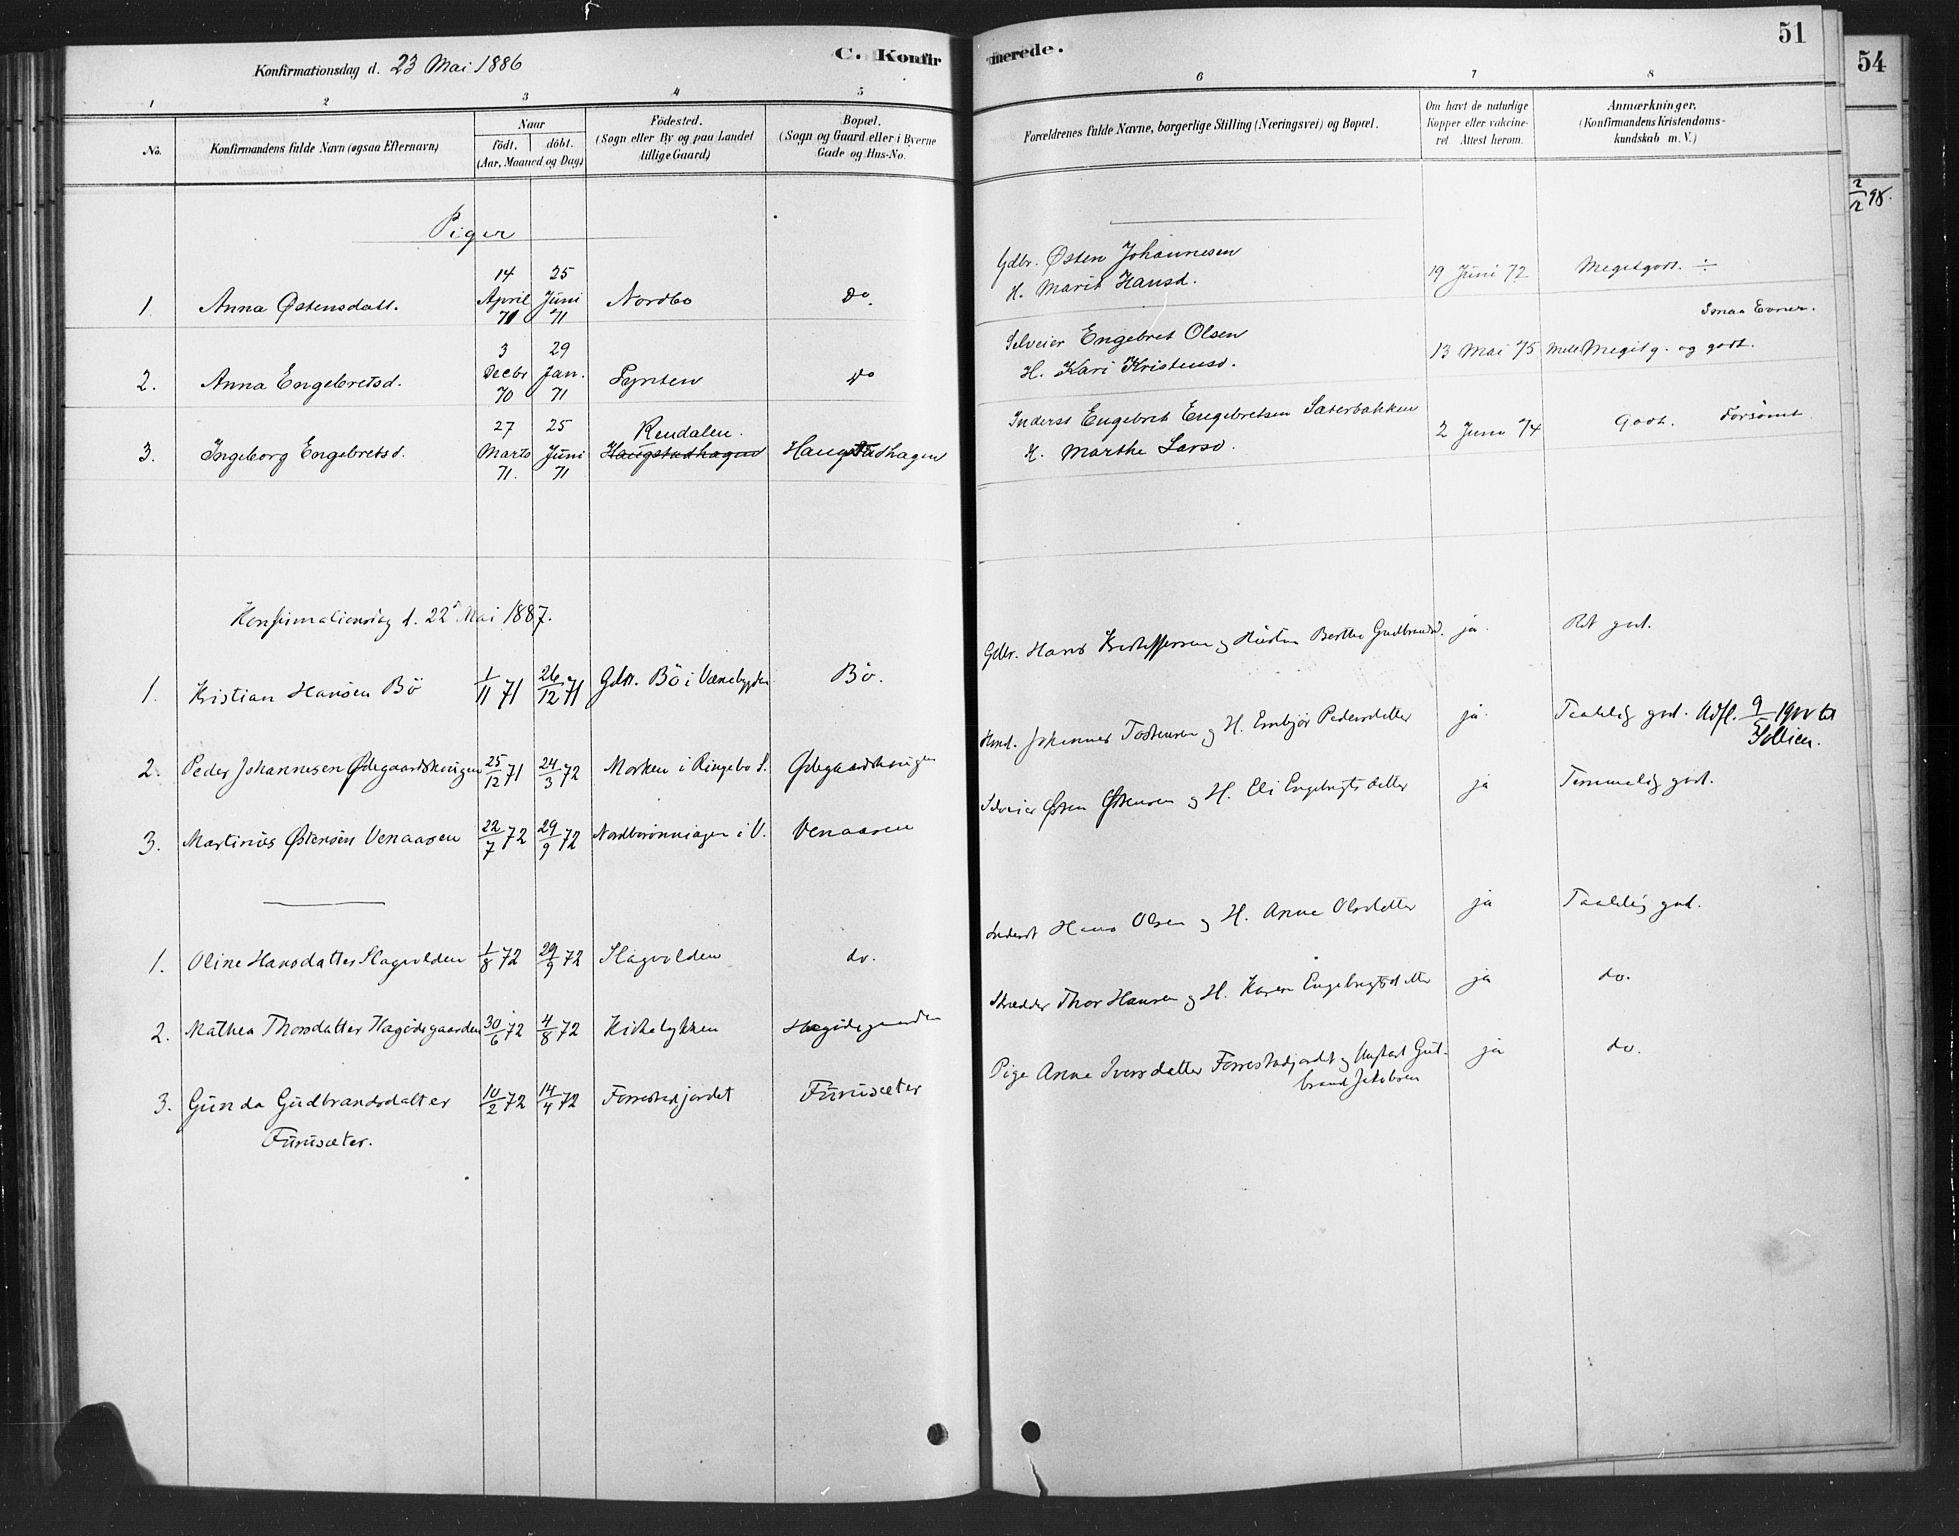 SAH, Ringebu prestekontor, Ministerialbok nr. 10, 1878-1898, s. 51